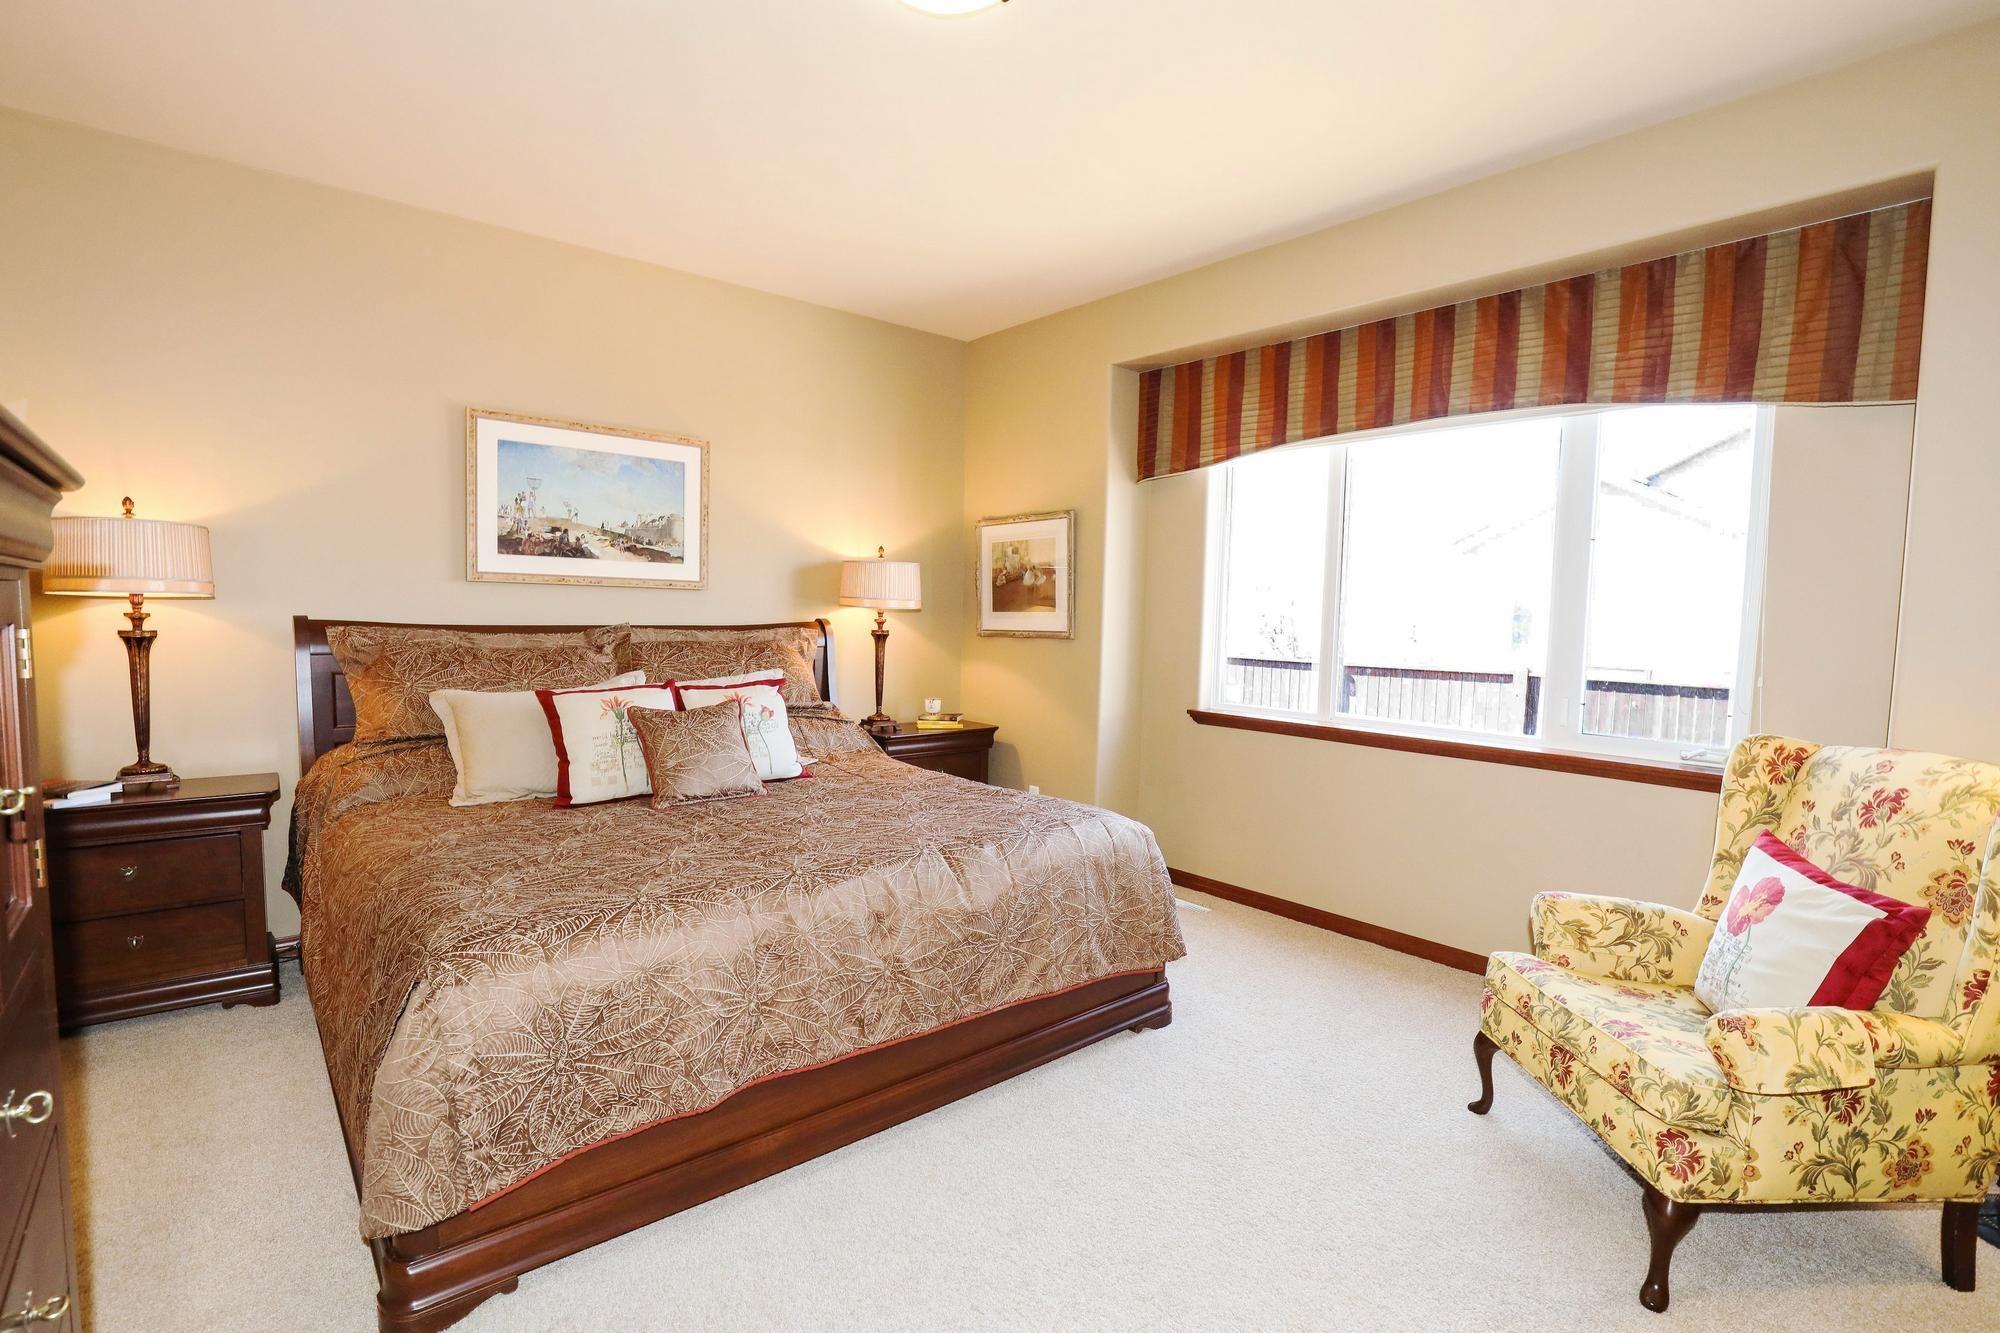 Photo 17: Photos: 7 Castle Ridge Drive in Winnipeg: Linden Ridge Single Family Detached for sale (1M)  : MLS®# 202107901